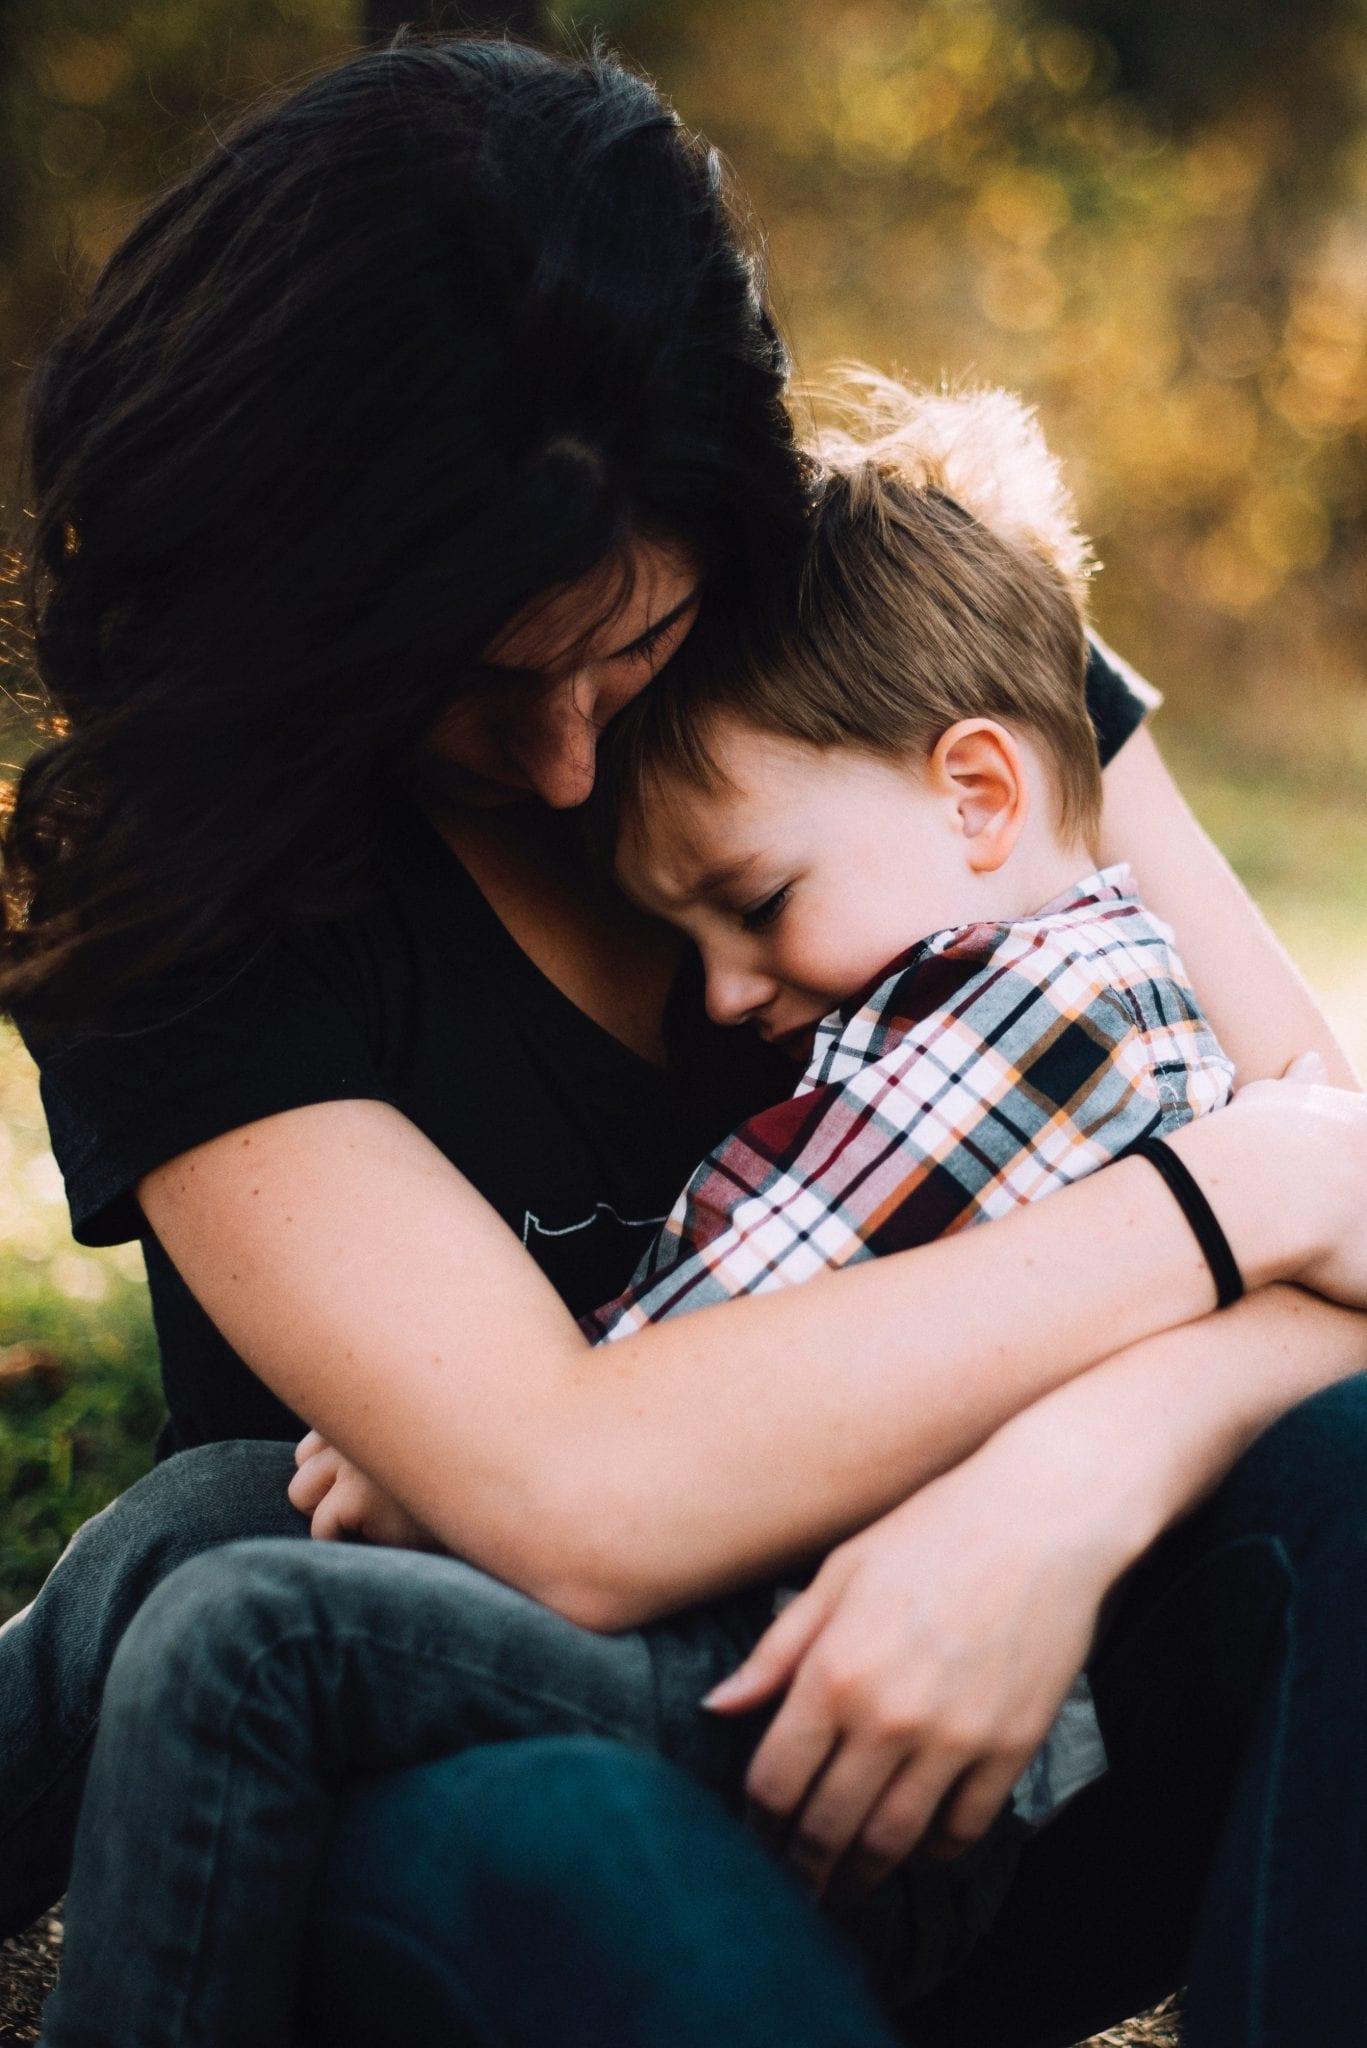 Woman hugging upset little boy; image by Jordan Whitt, via Unsplash.com.